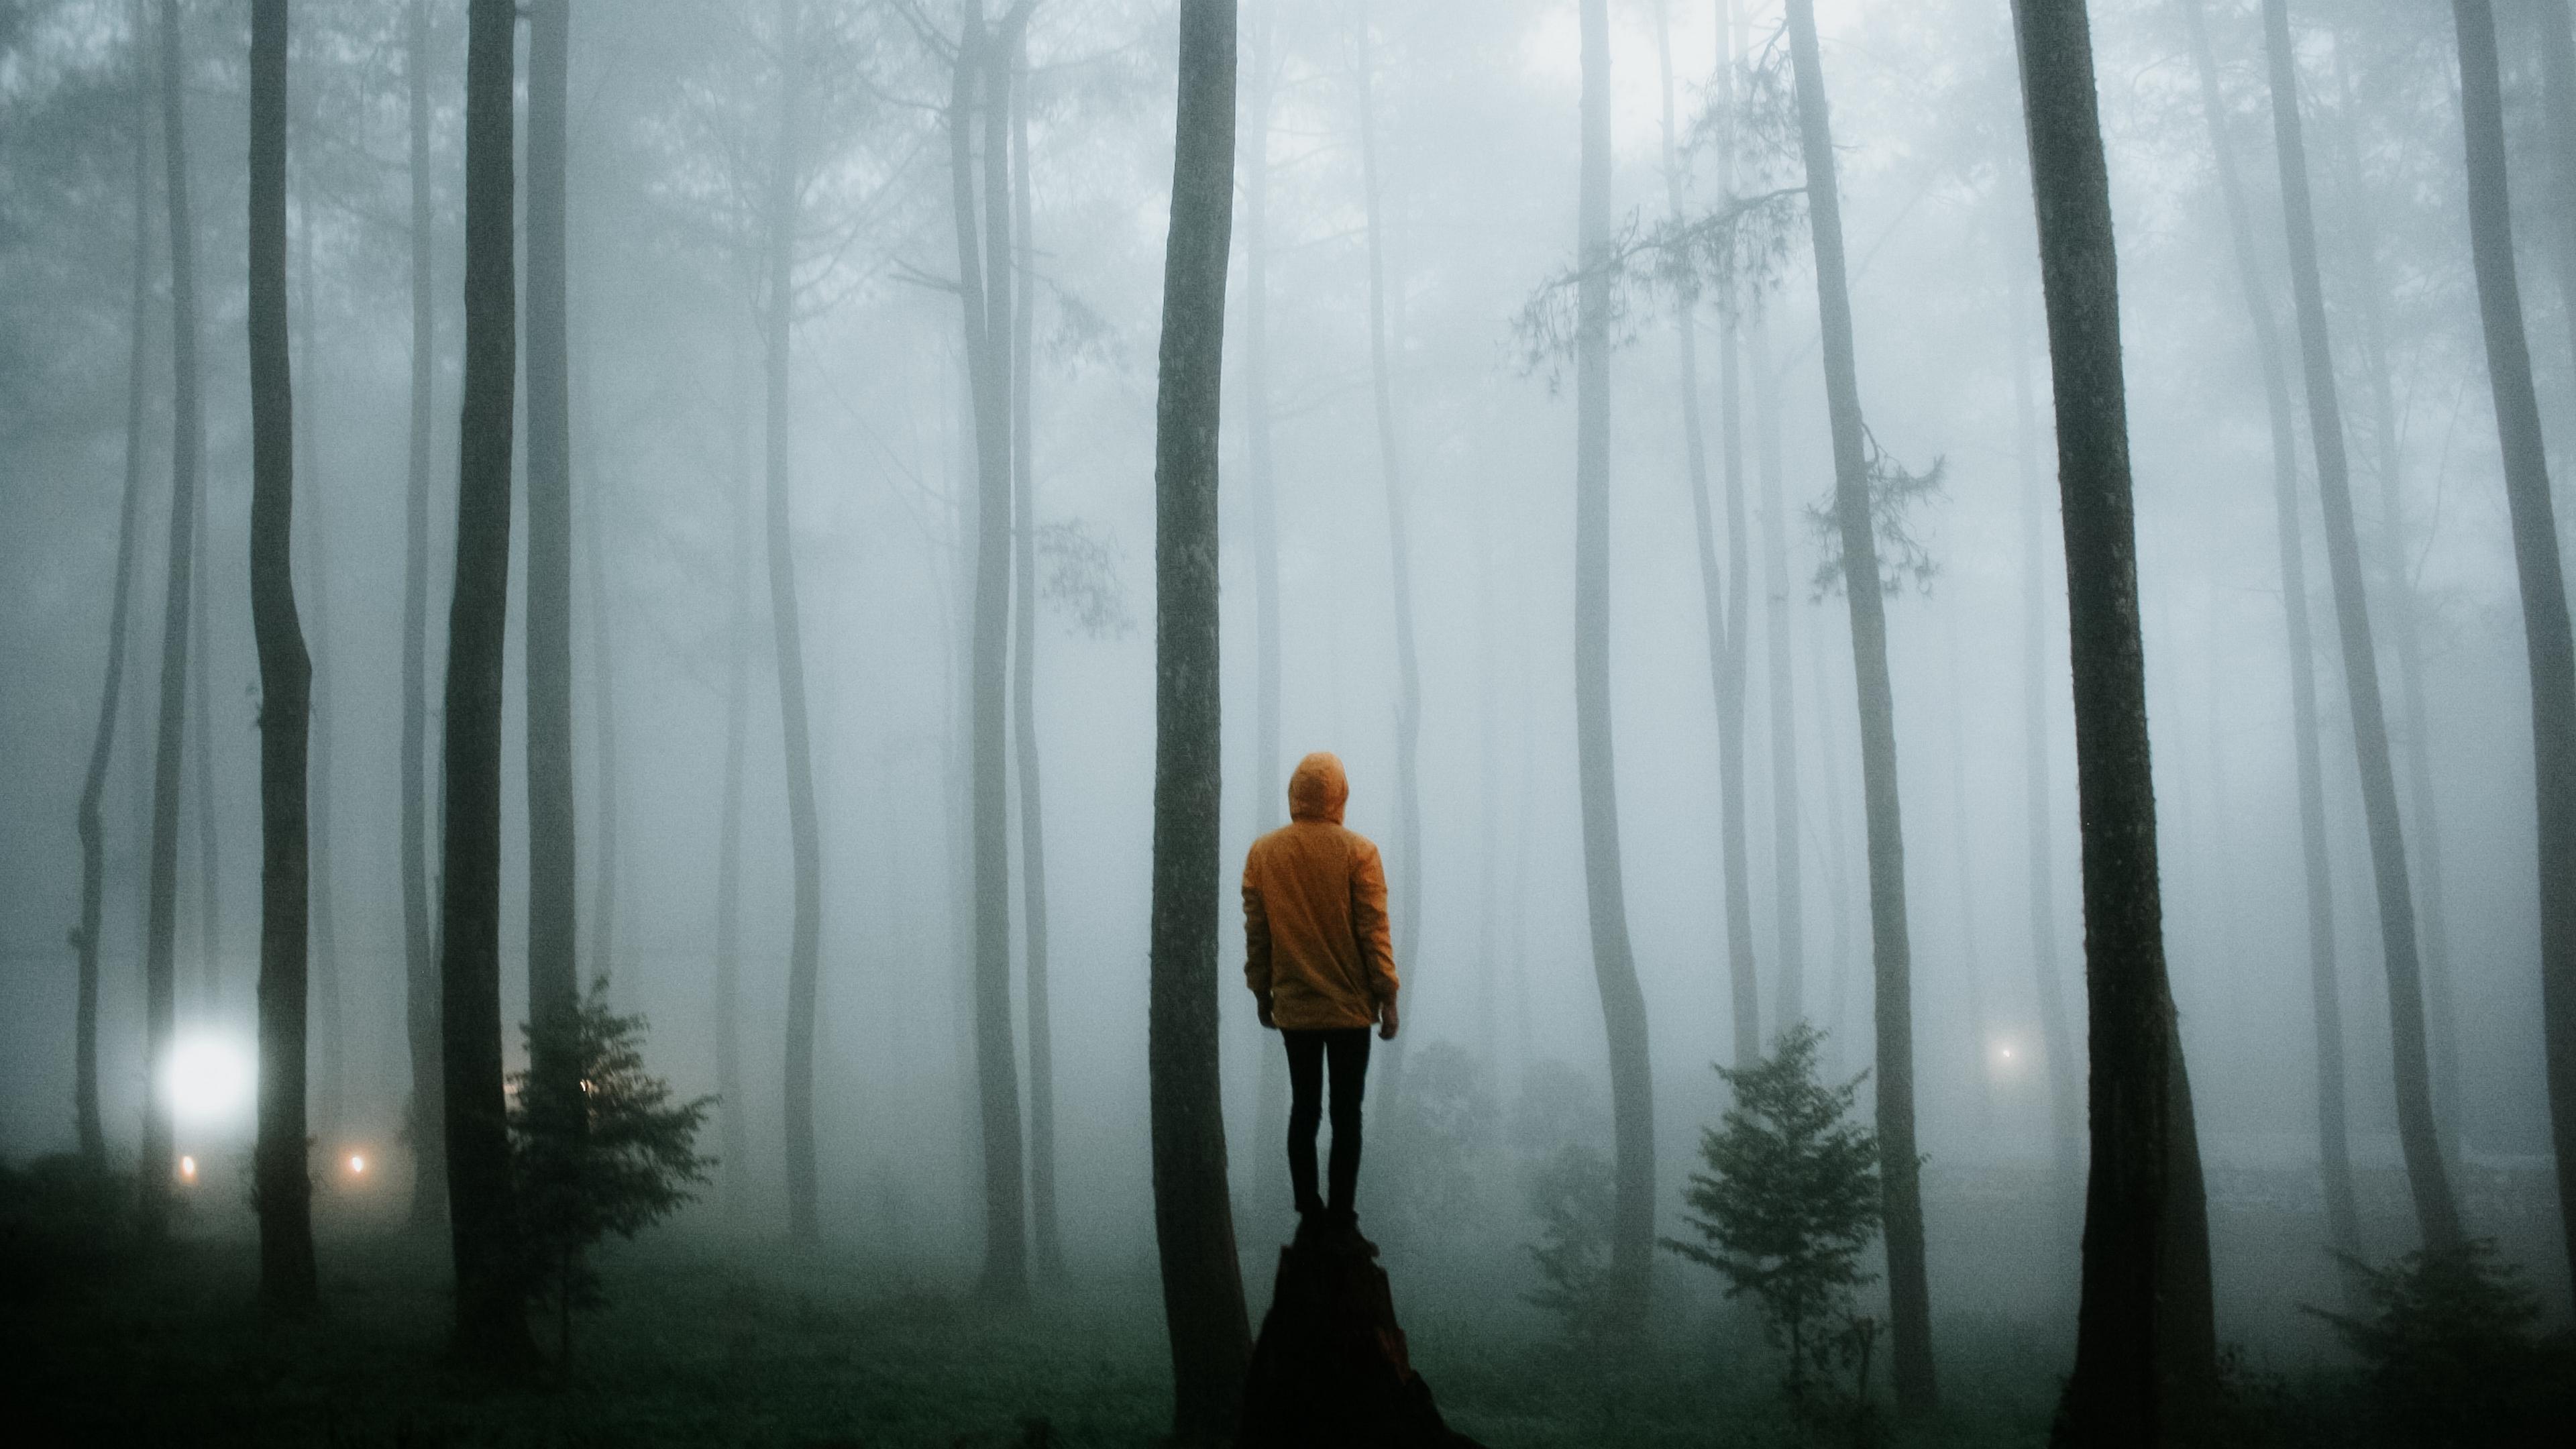 man fog loneliness forest trees 4k 1541116655 - man, fog, loneliness, forest, trees 4k - Man, loneliness, fog